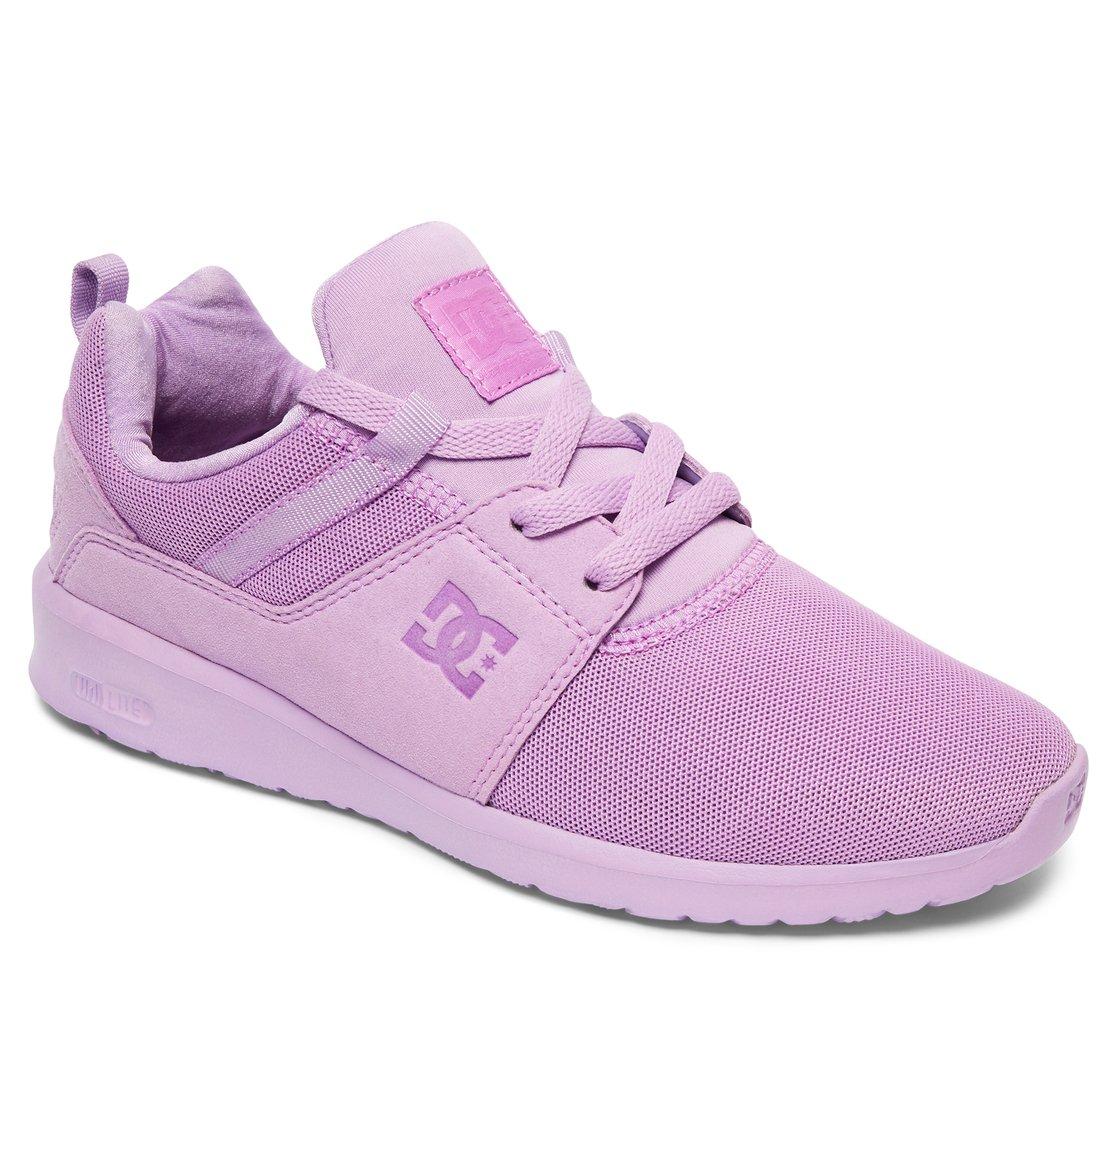 women 39 s heathrow shoes adjs700021 dc shoes. Black Bedroom Furniture Sets. Home Design Ideas